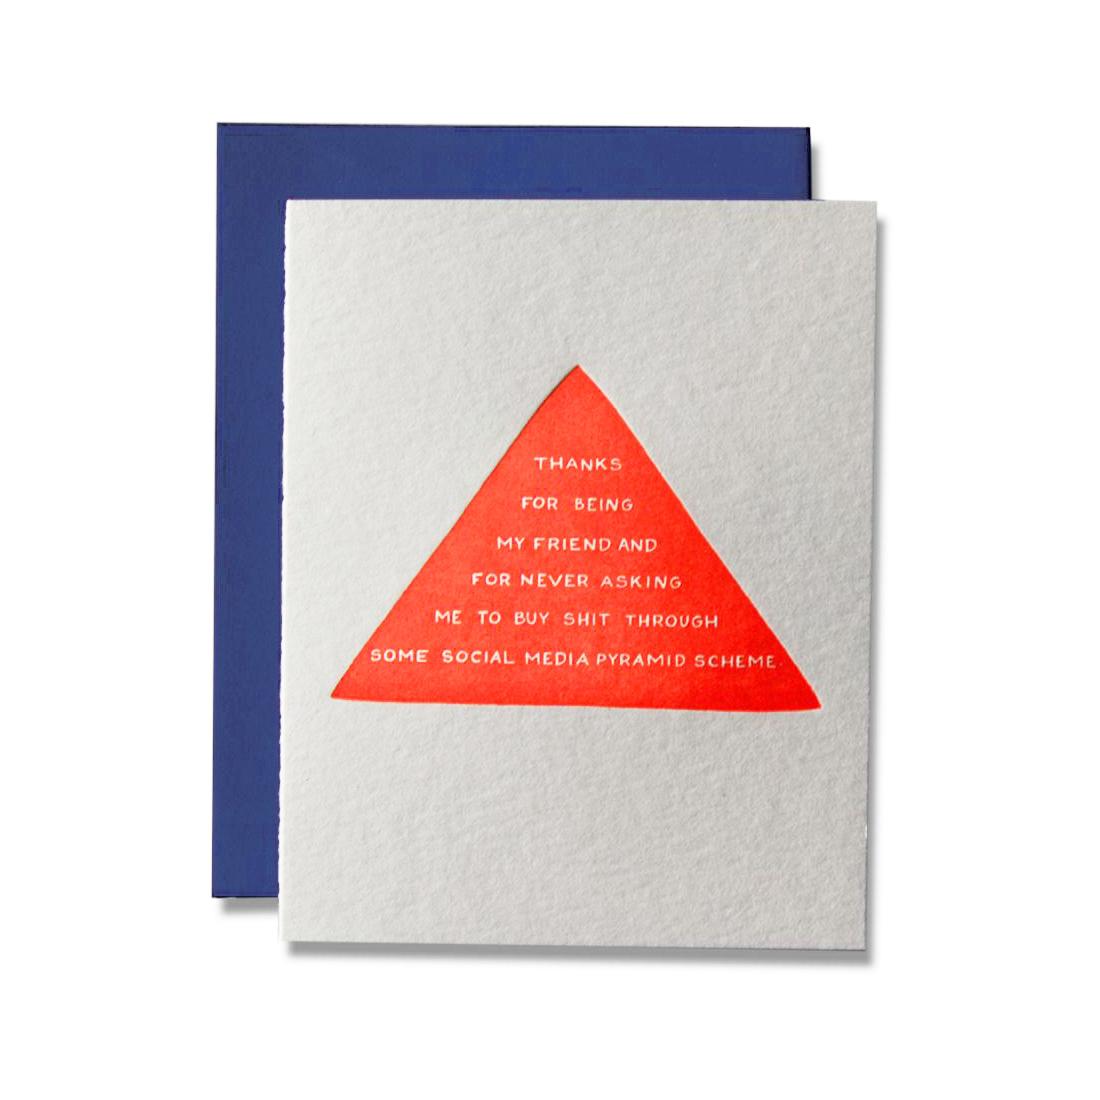 Ladyfingers Letterpress Social Media Pyramid Scheme